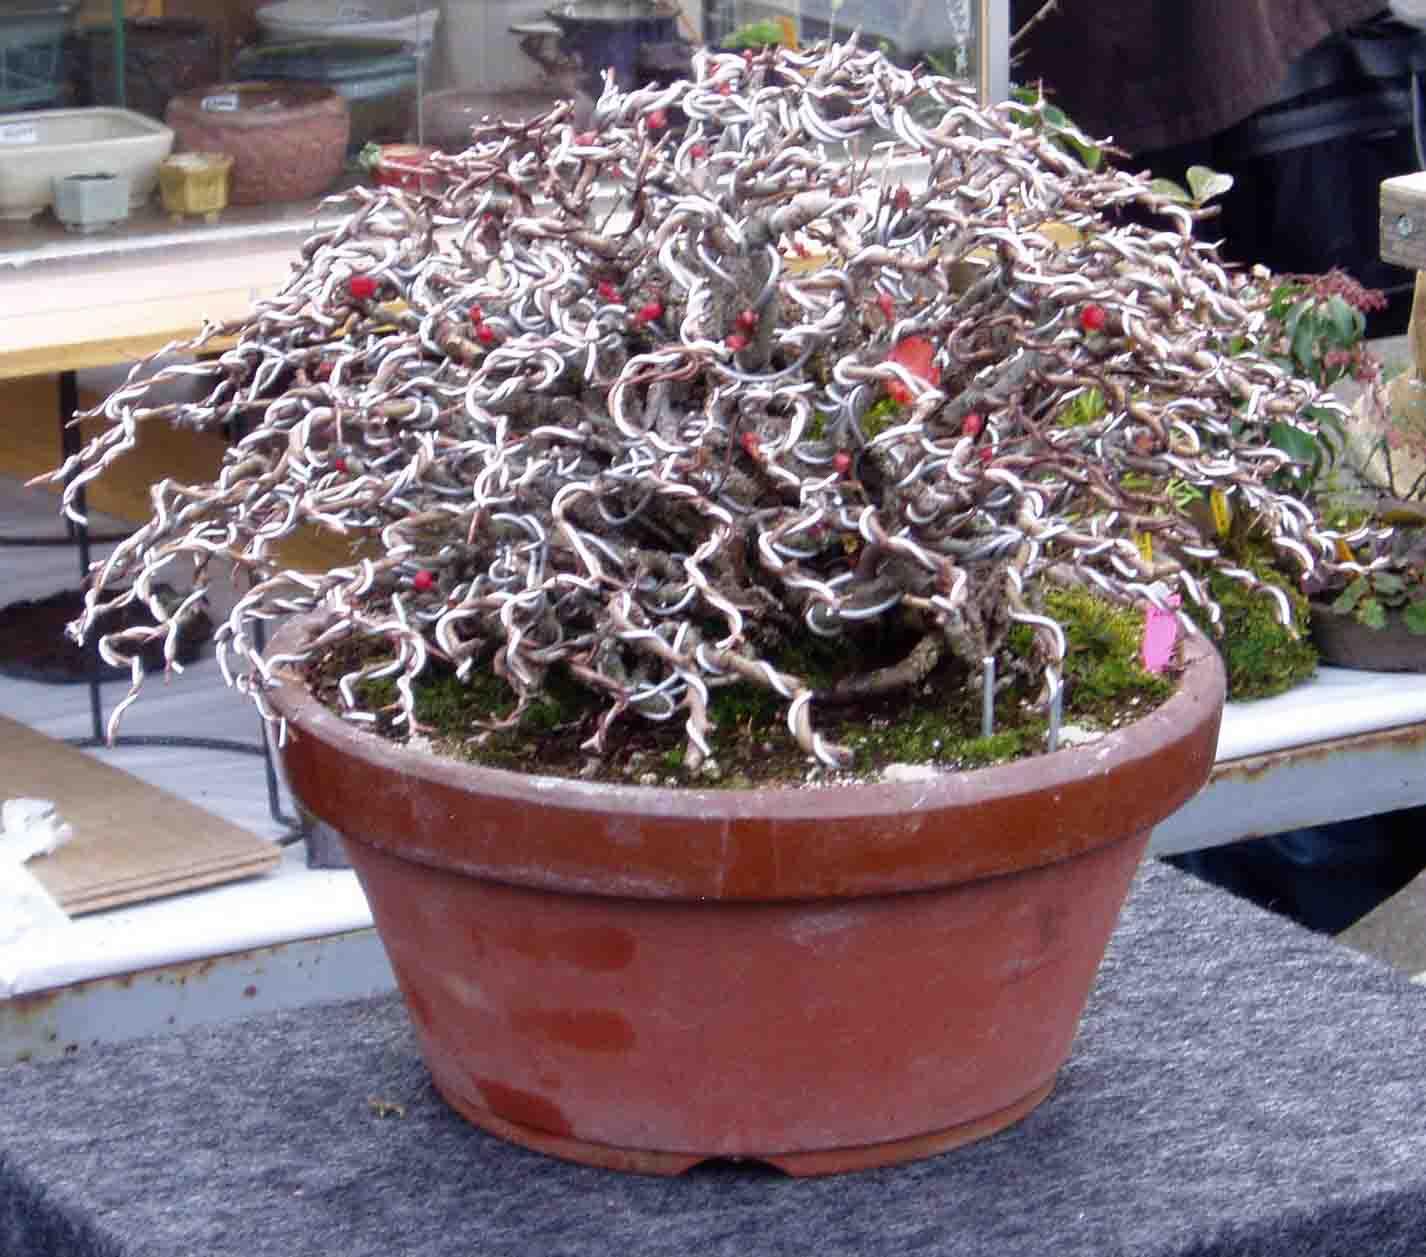 Kigawa39s Bonsai Blog Wire Unwire And Rewire